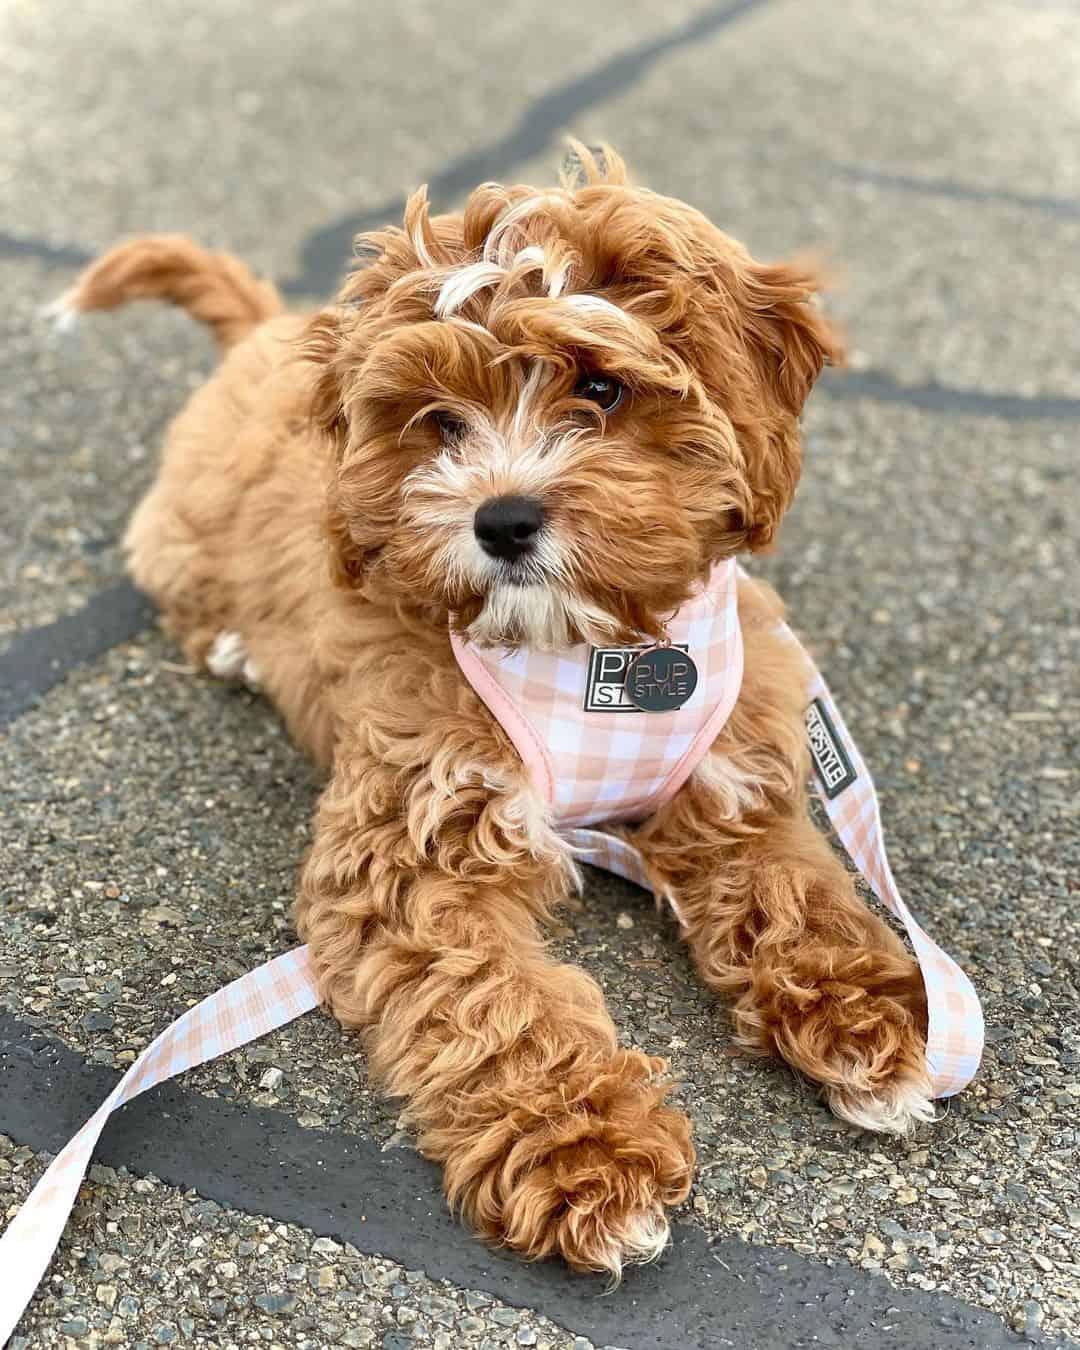 adorable cavapoo dog lying on the ground